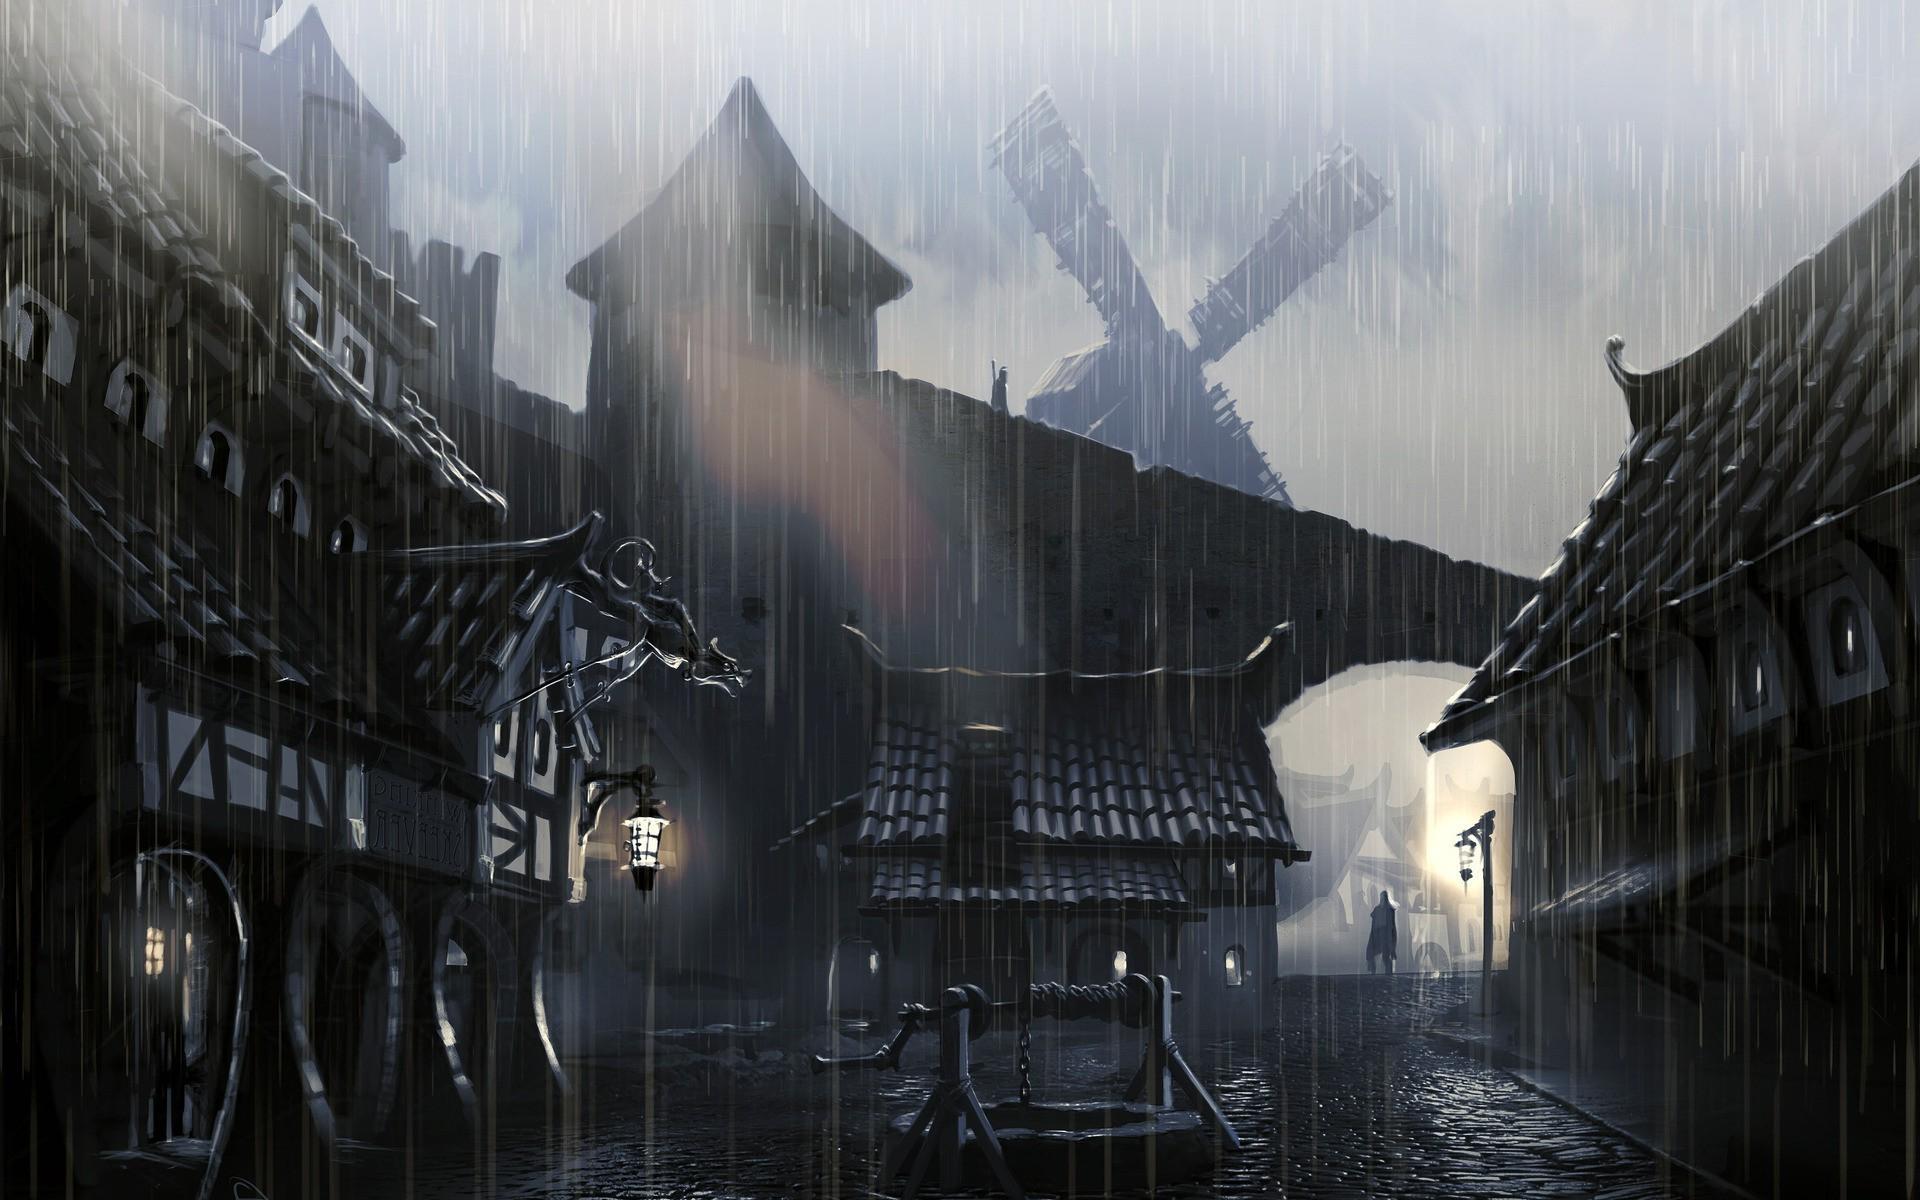 … Elder Scrolls V – Skyrim HD Wallpaper 1920×1200